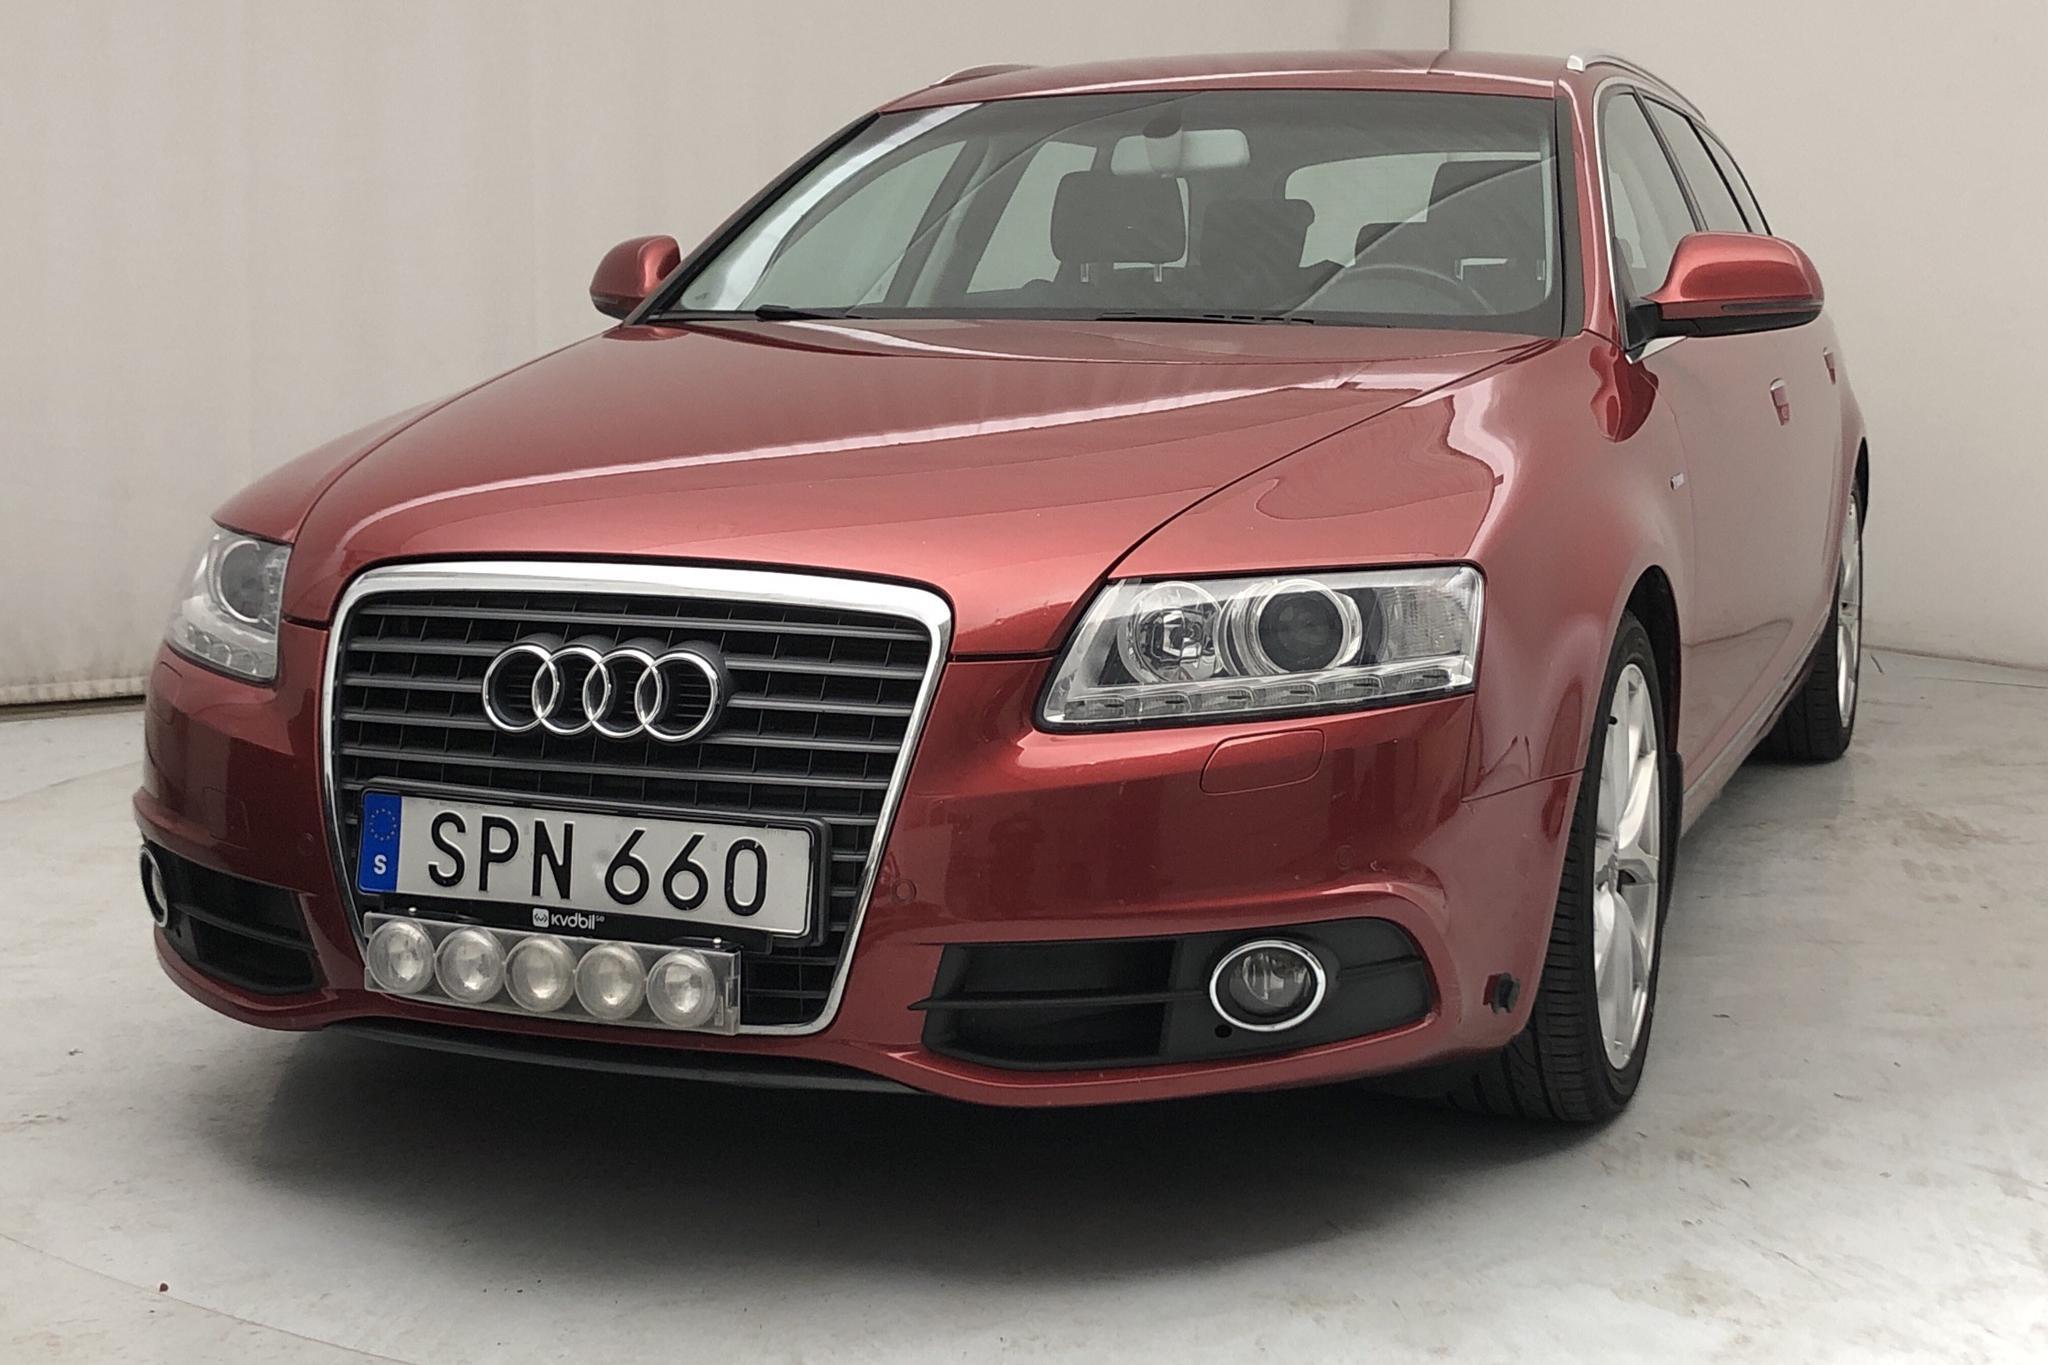 Audi A6 2.0 TDIe Avant (136hk) - 11 619 mil - Manuell - röd - 2011